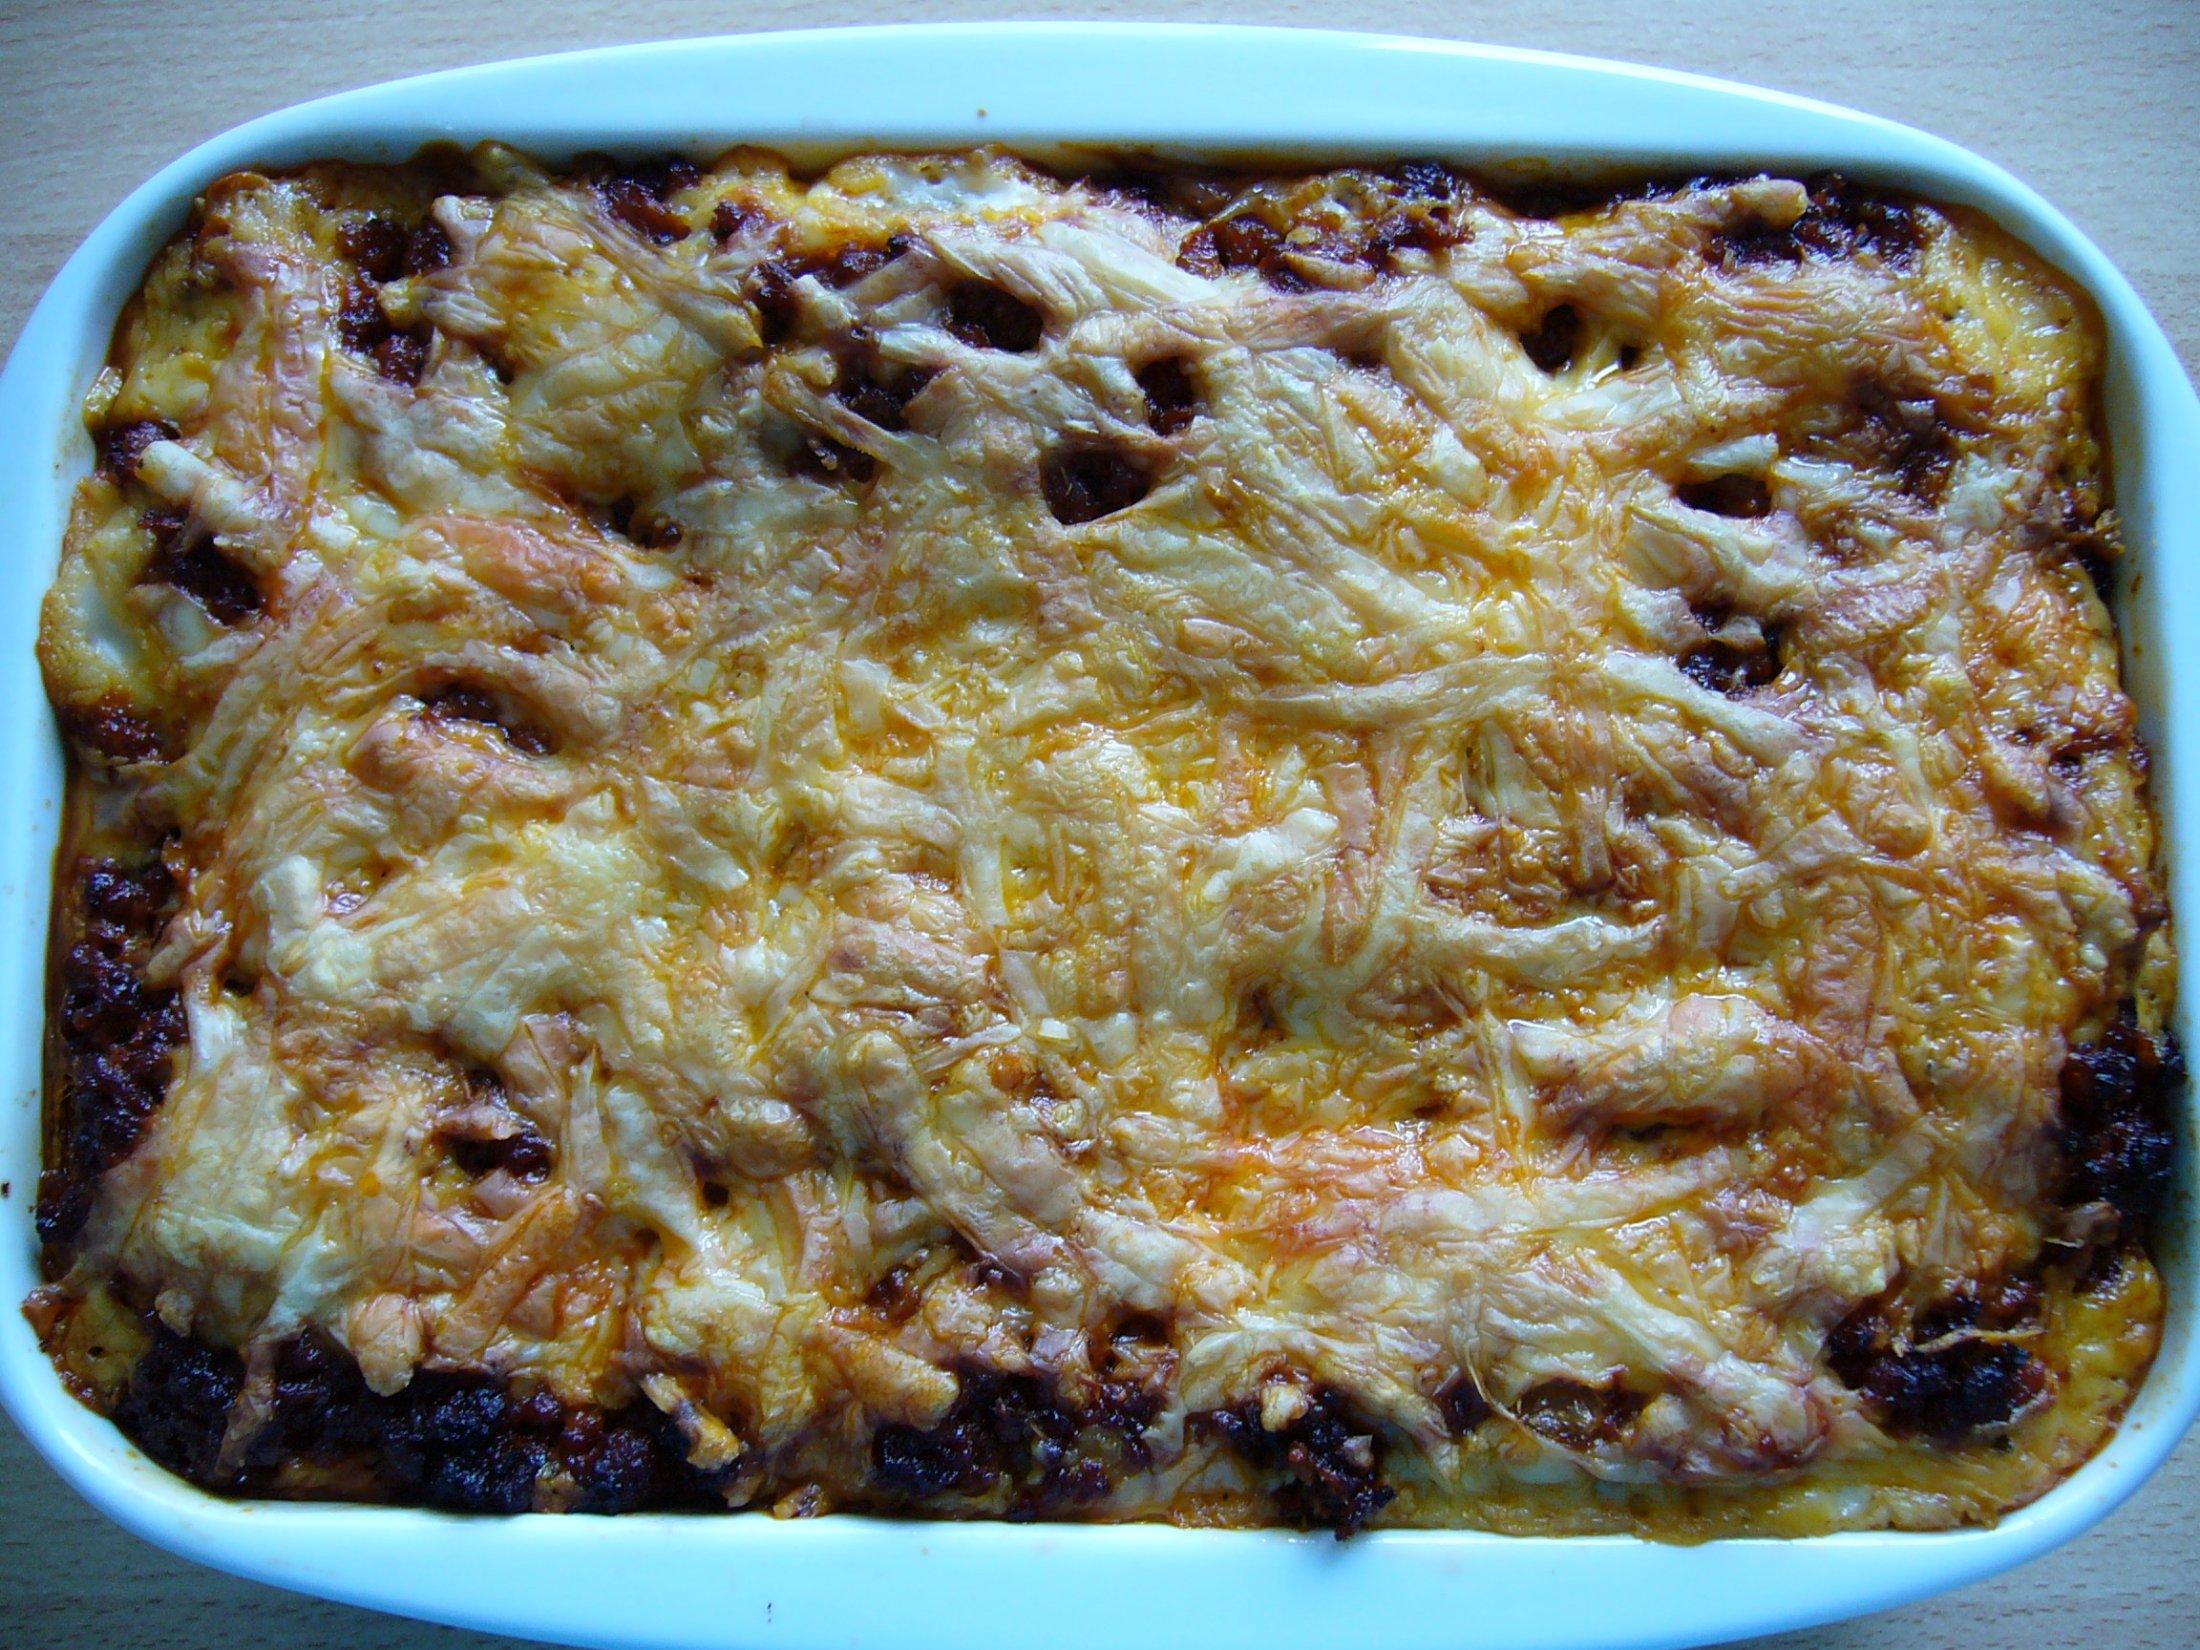 Recept Lasagne s mletým masem a bešamelem - Lasagne s mletým masem a bešamelem